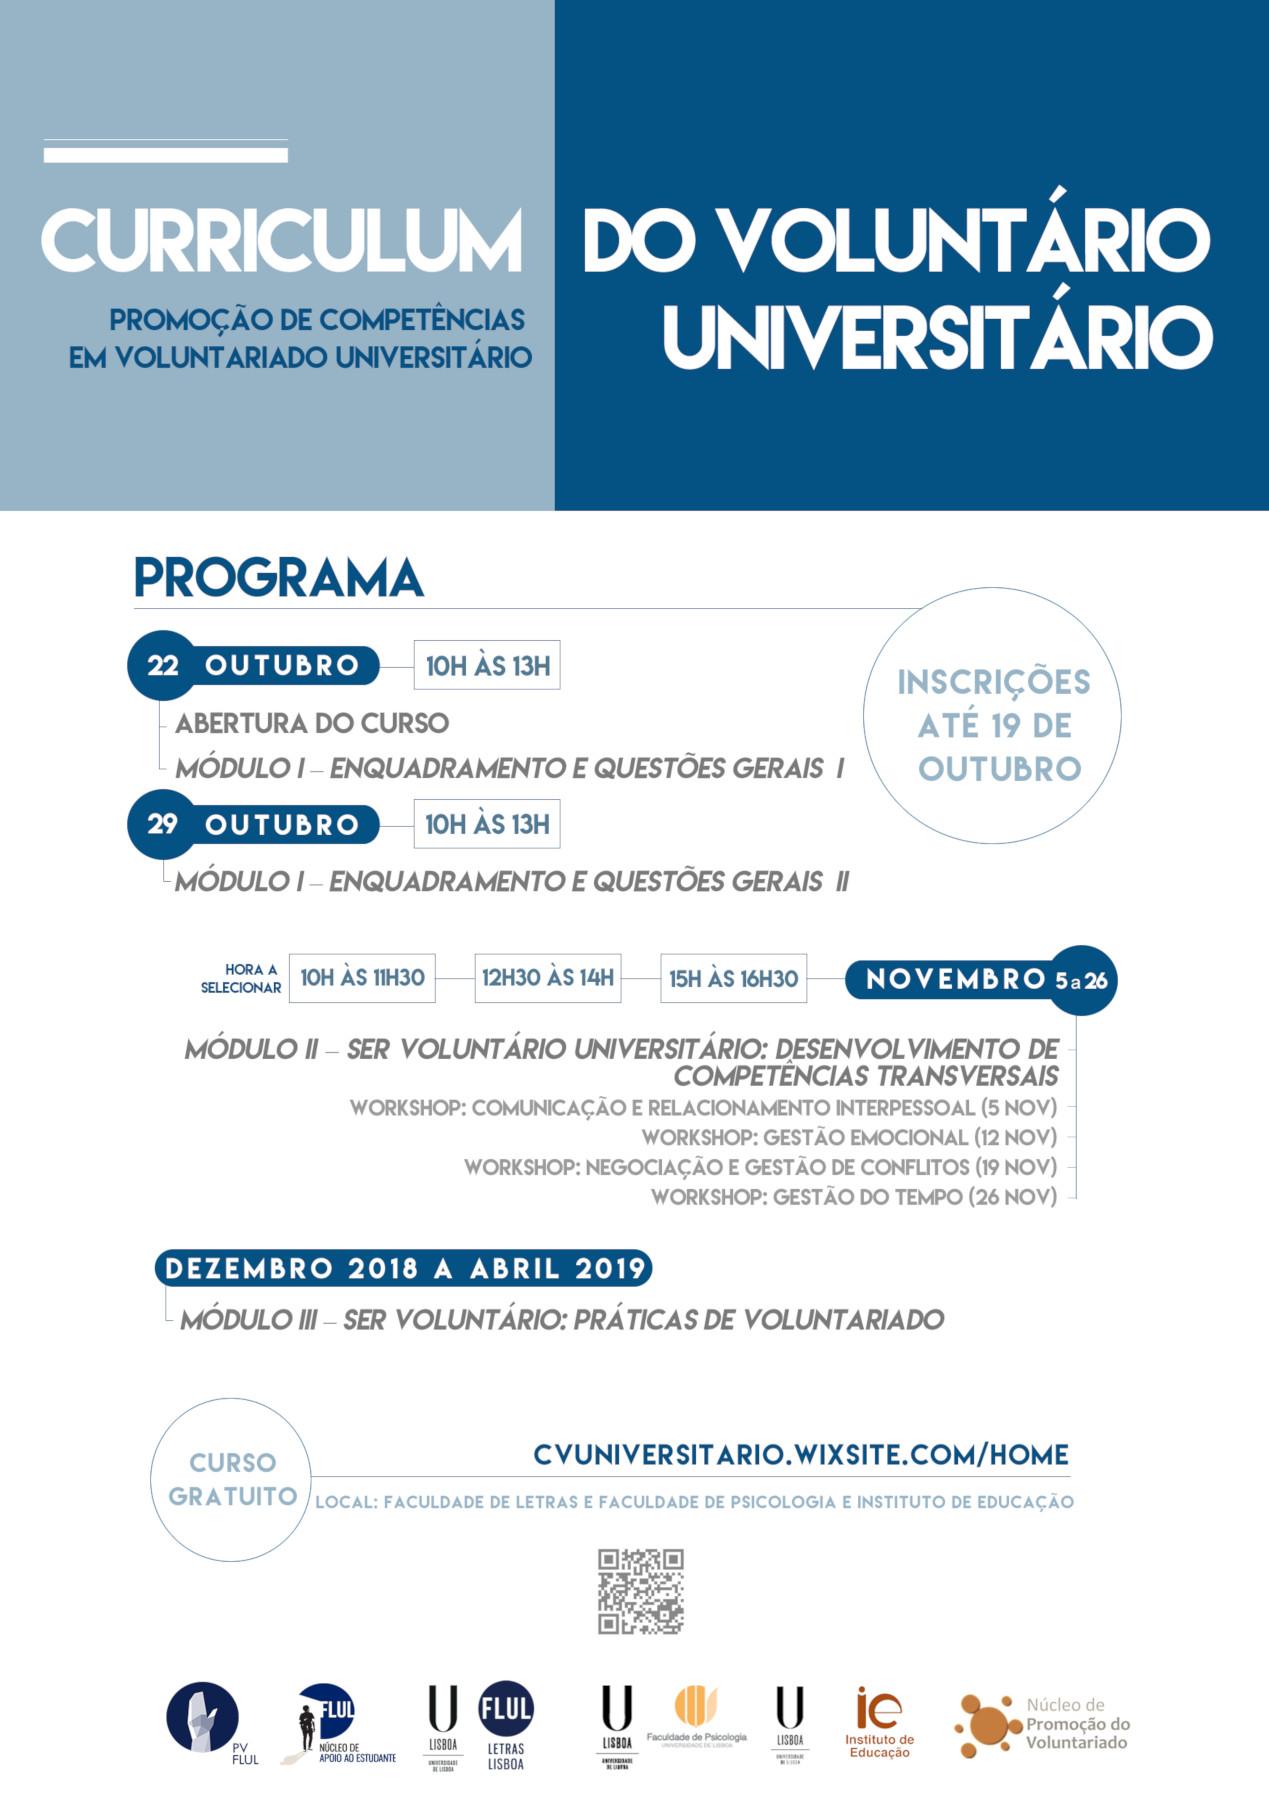 Curso de Voluntariado Universitário